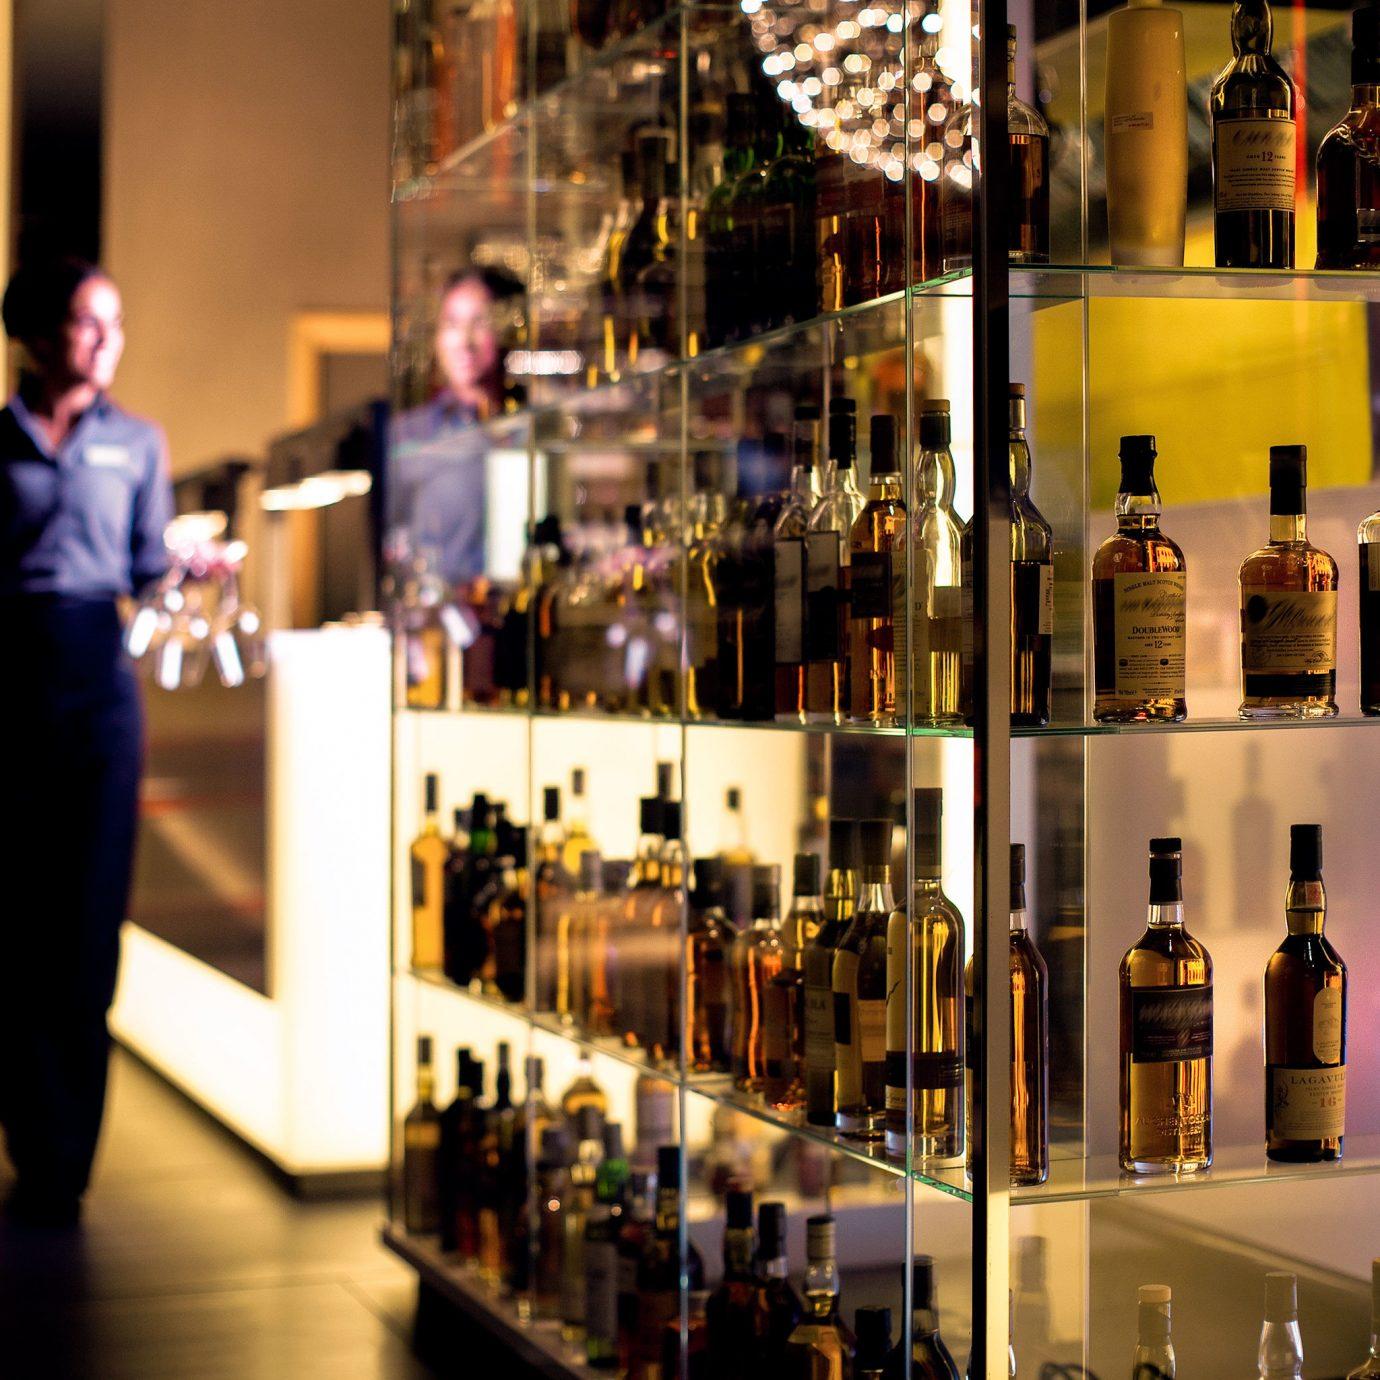 Bar Business City Dining Eat Hip Modern bottle wine Drink alcohol